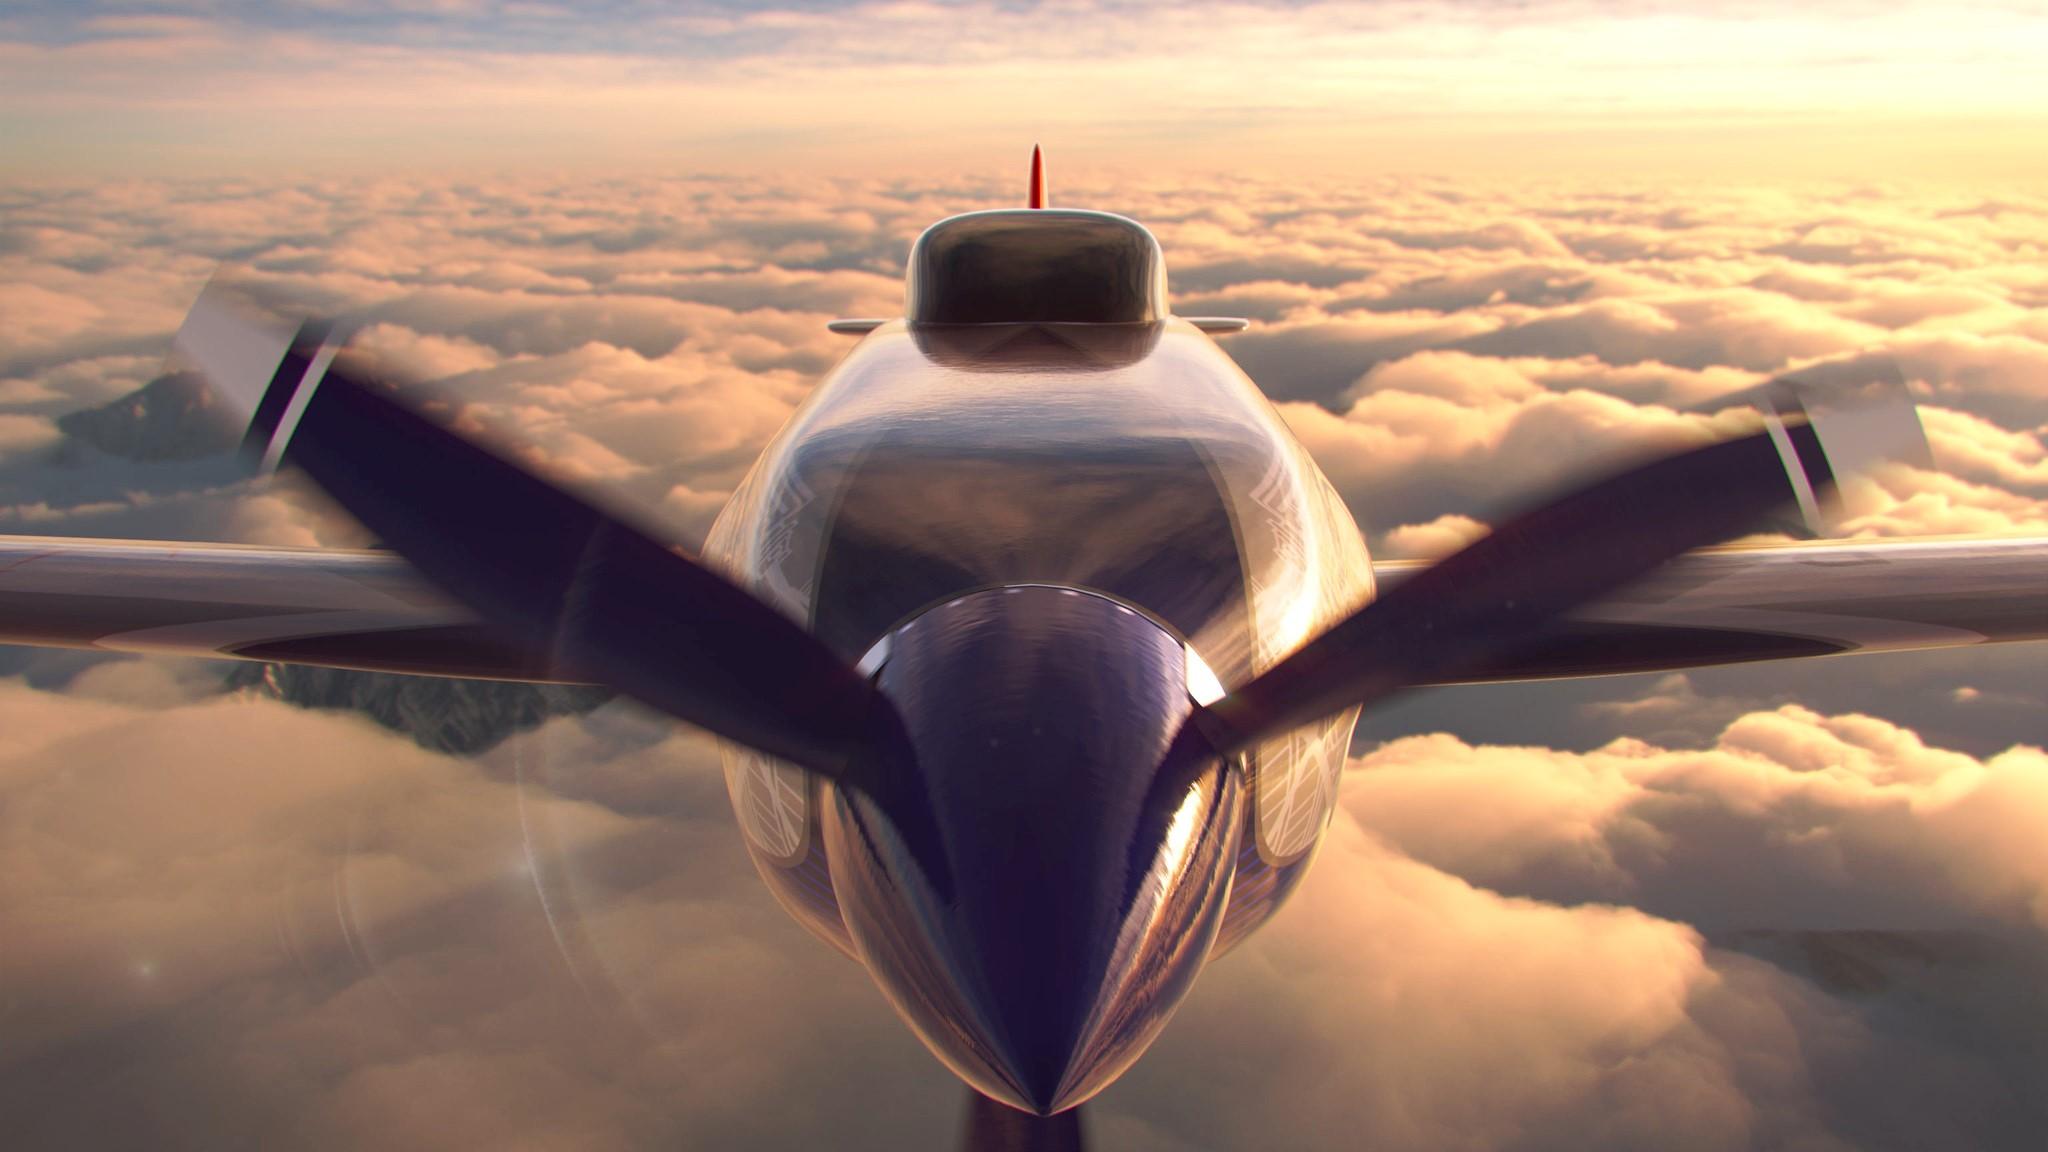 Rolls-Royce-Elektroflugzeug-Erstflug-im-Fr-hjahr-2021